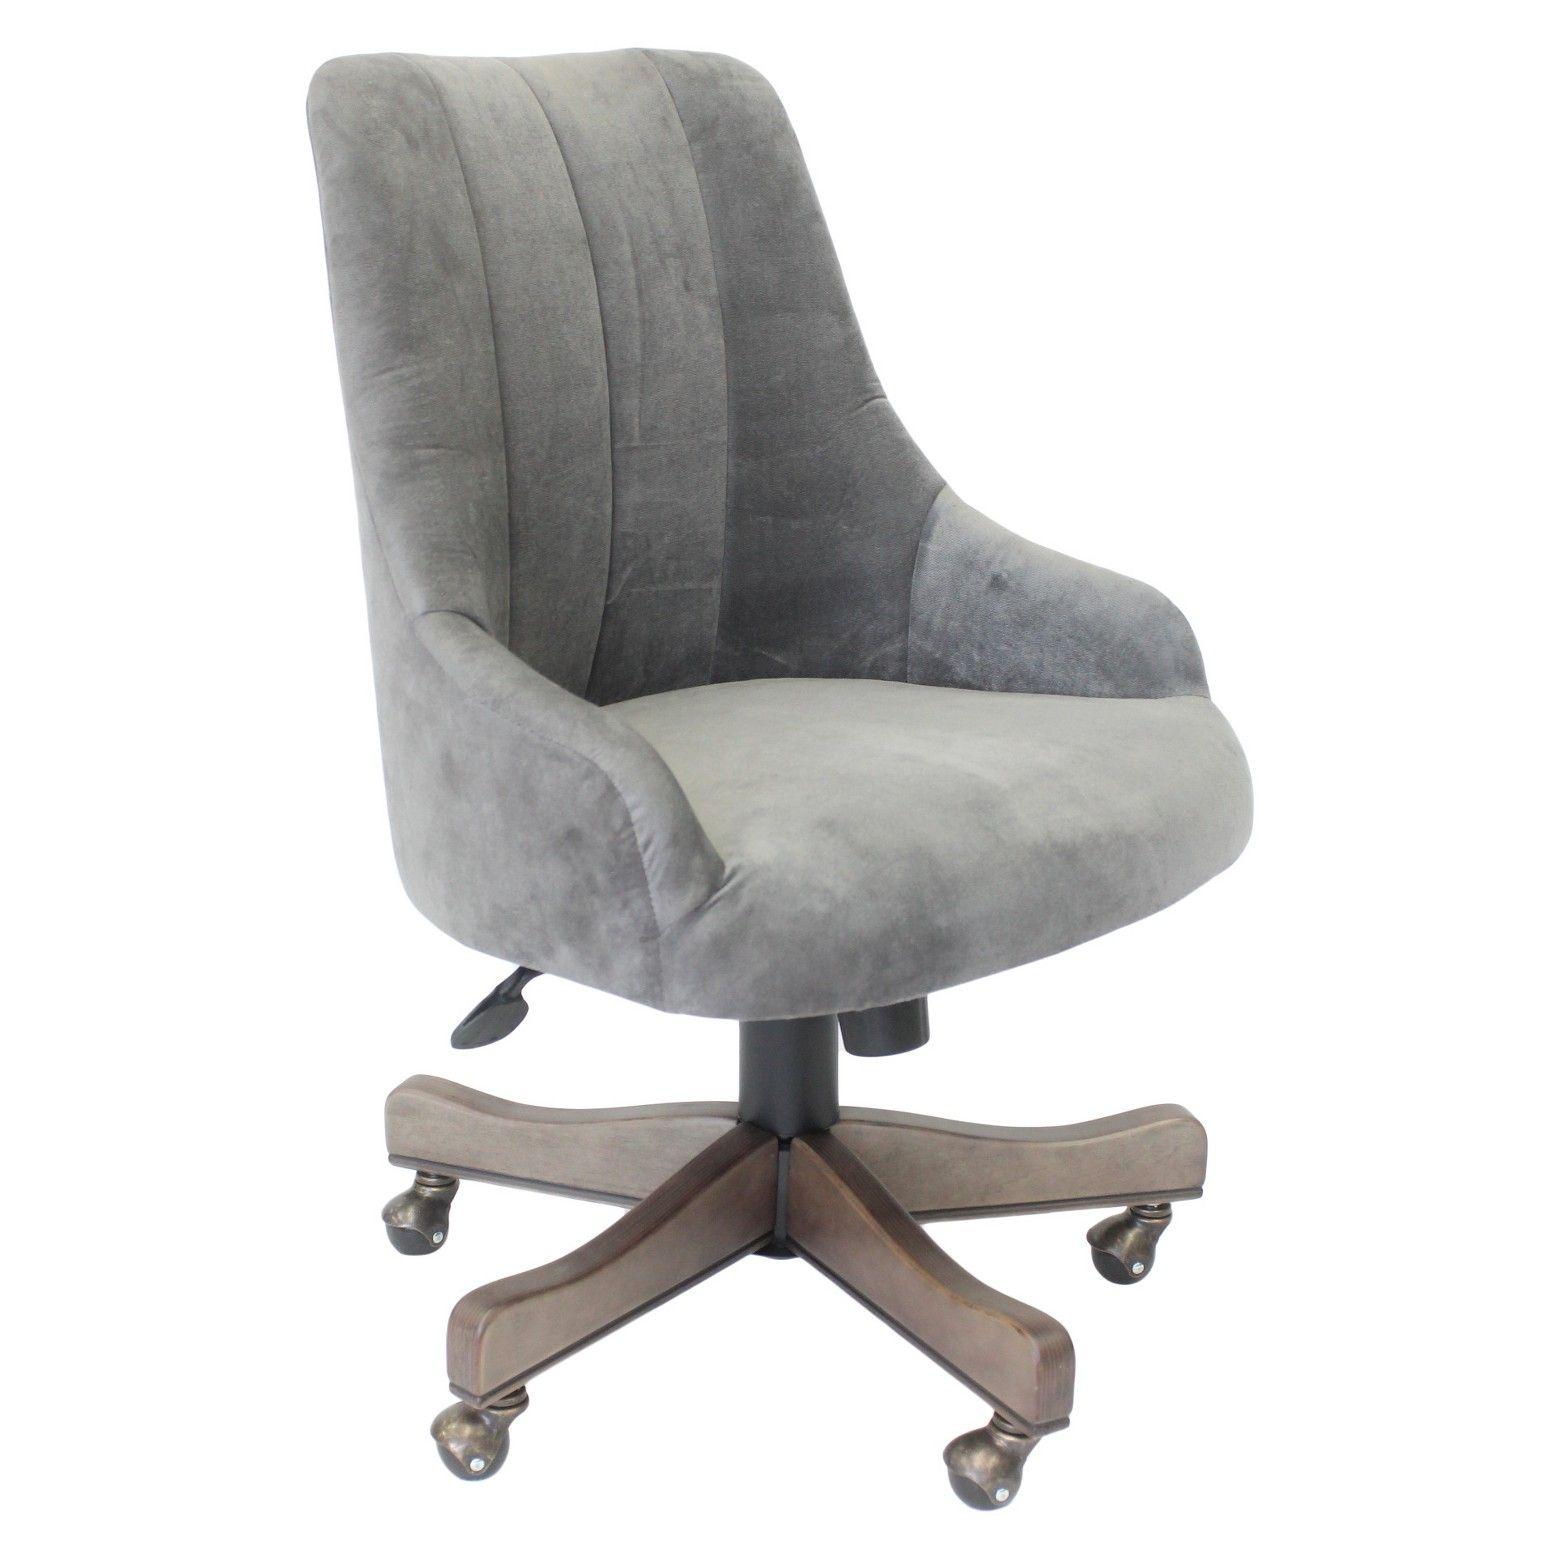 Shubert Desk Chair